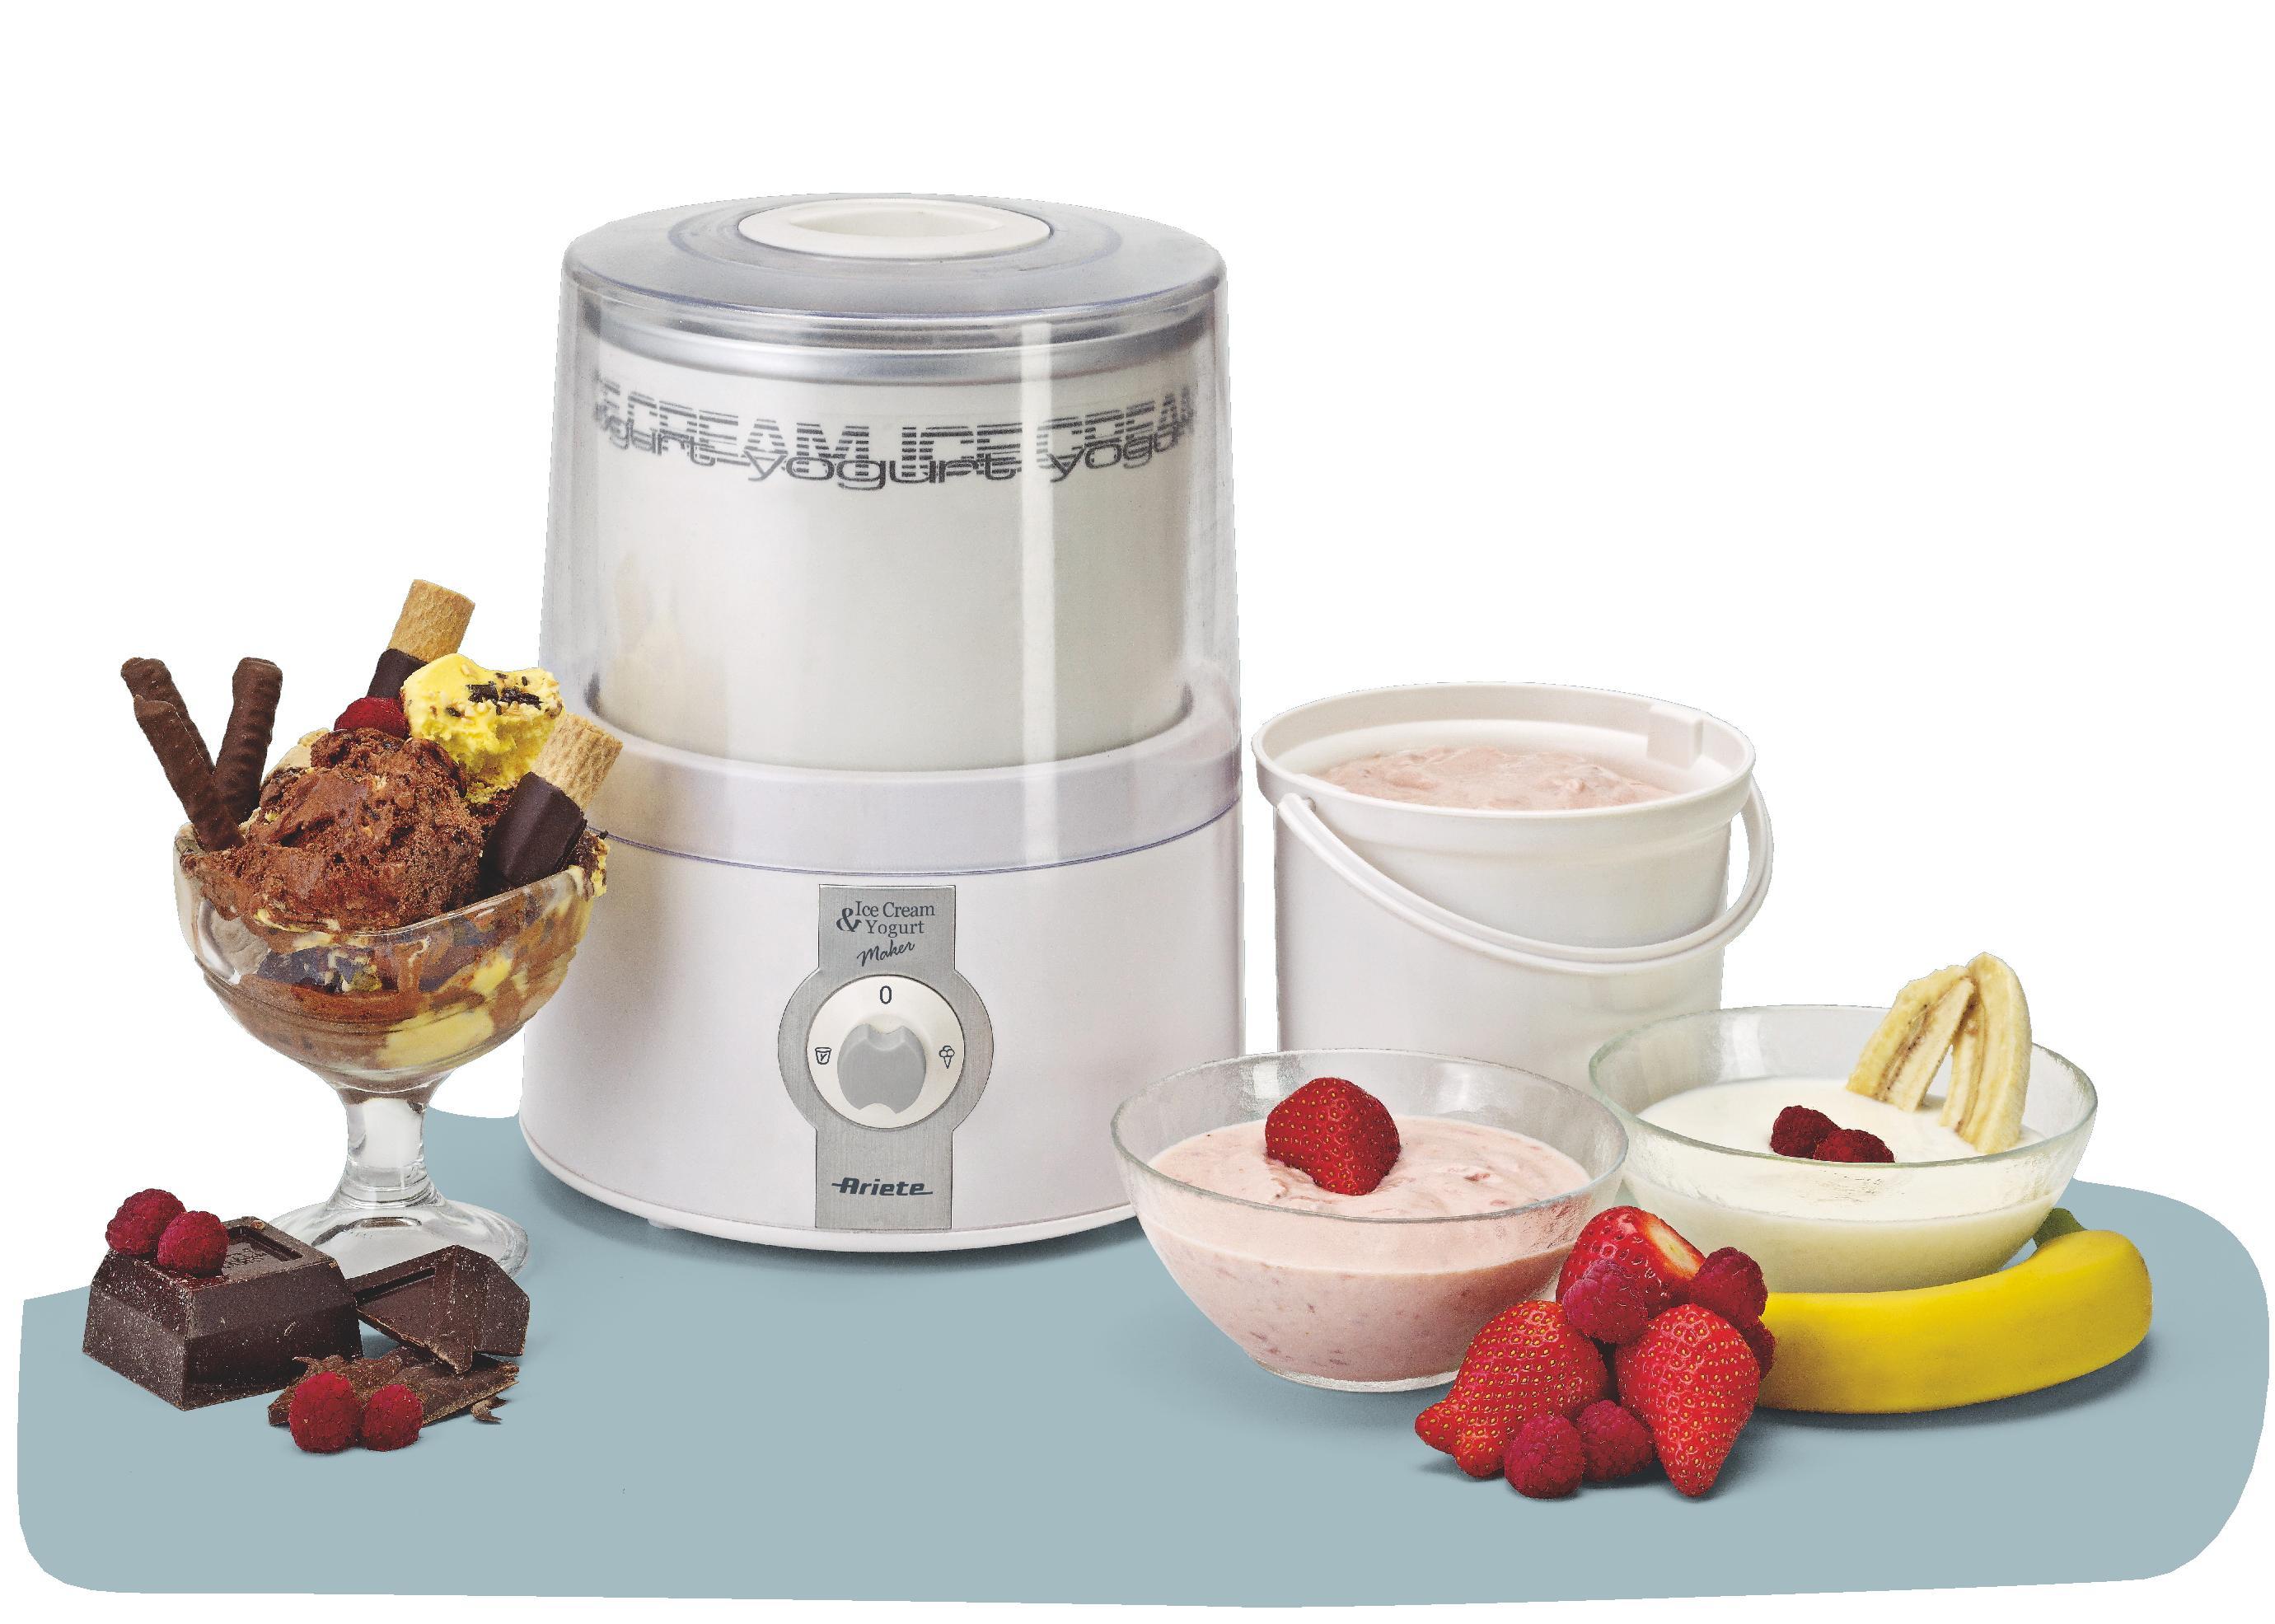 Ice cream & Yogurt maker - Ariete (EN)